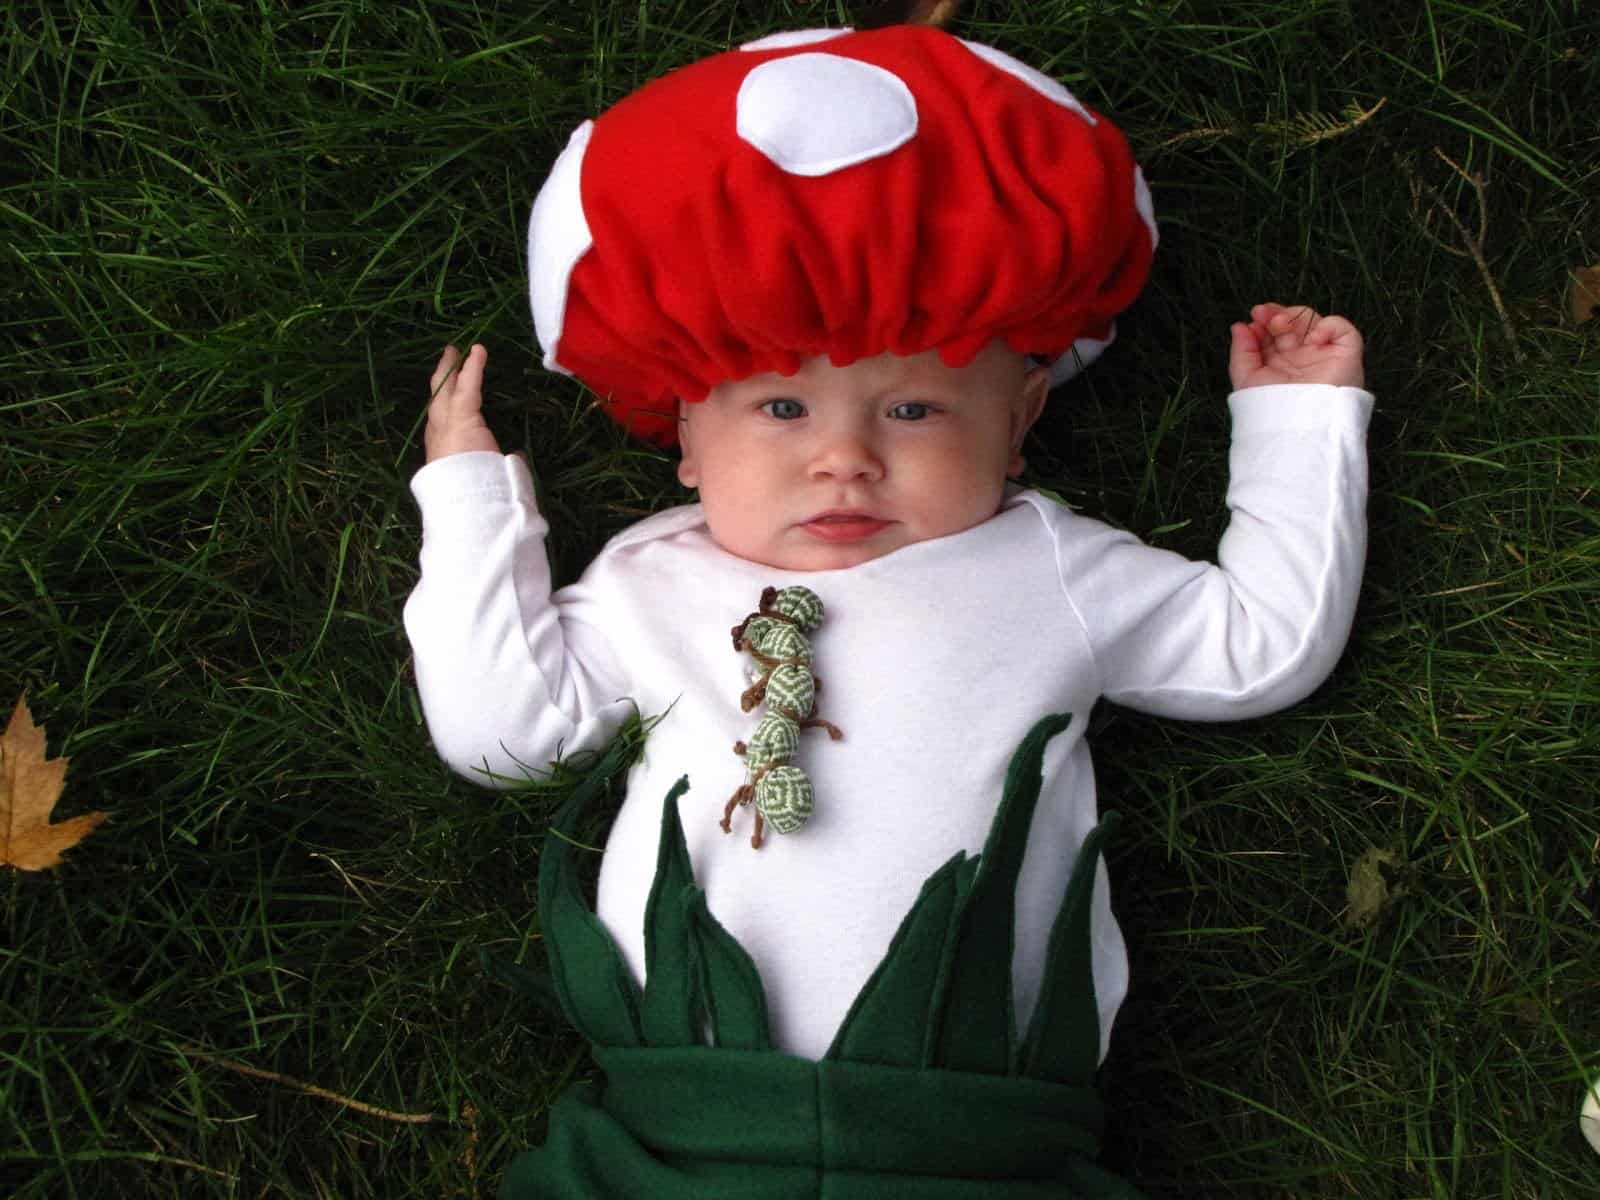 Baby mushroom with a caterpillar